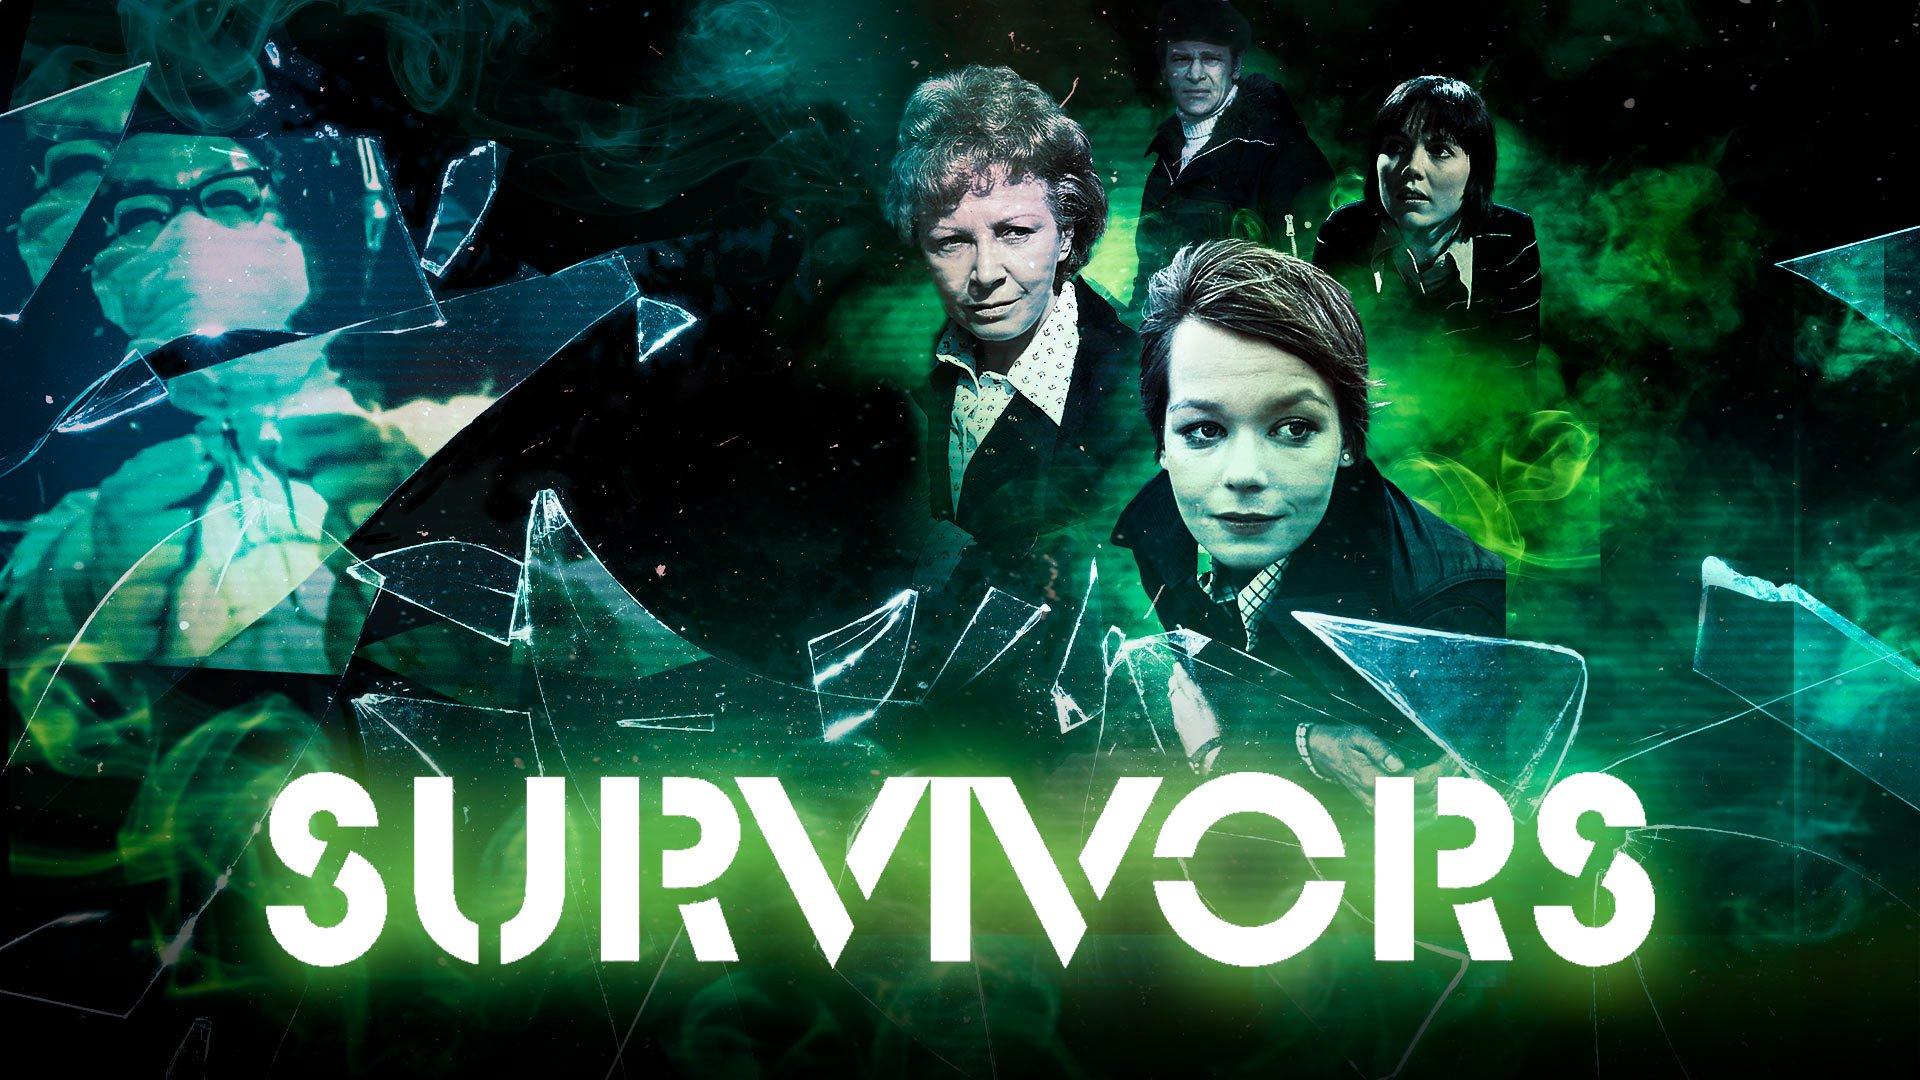 Survivors on BritBox UK